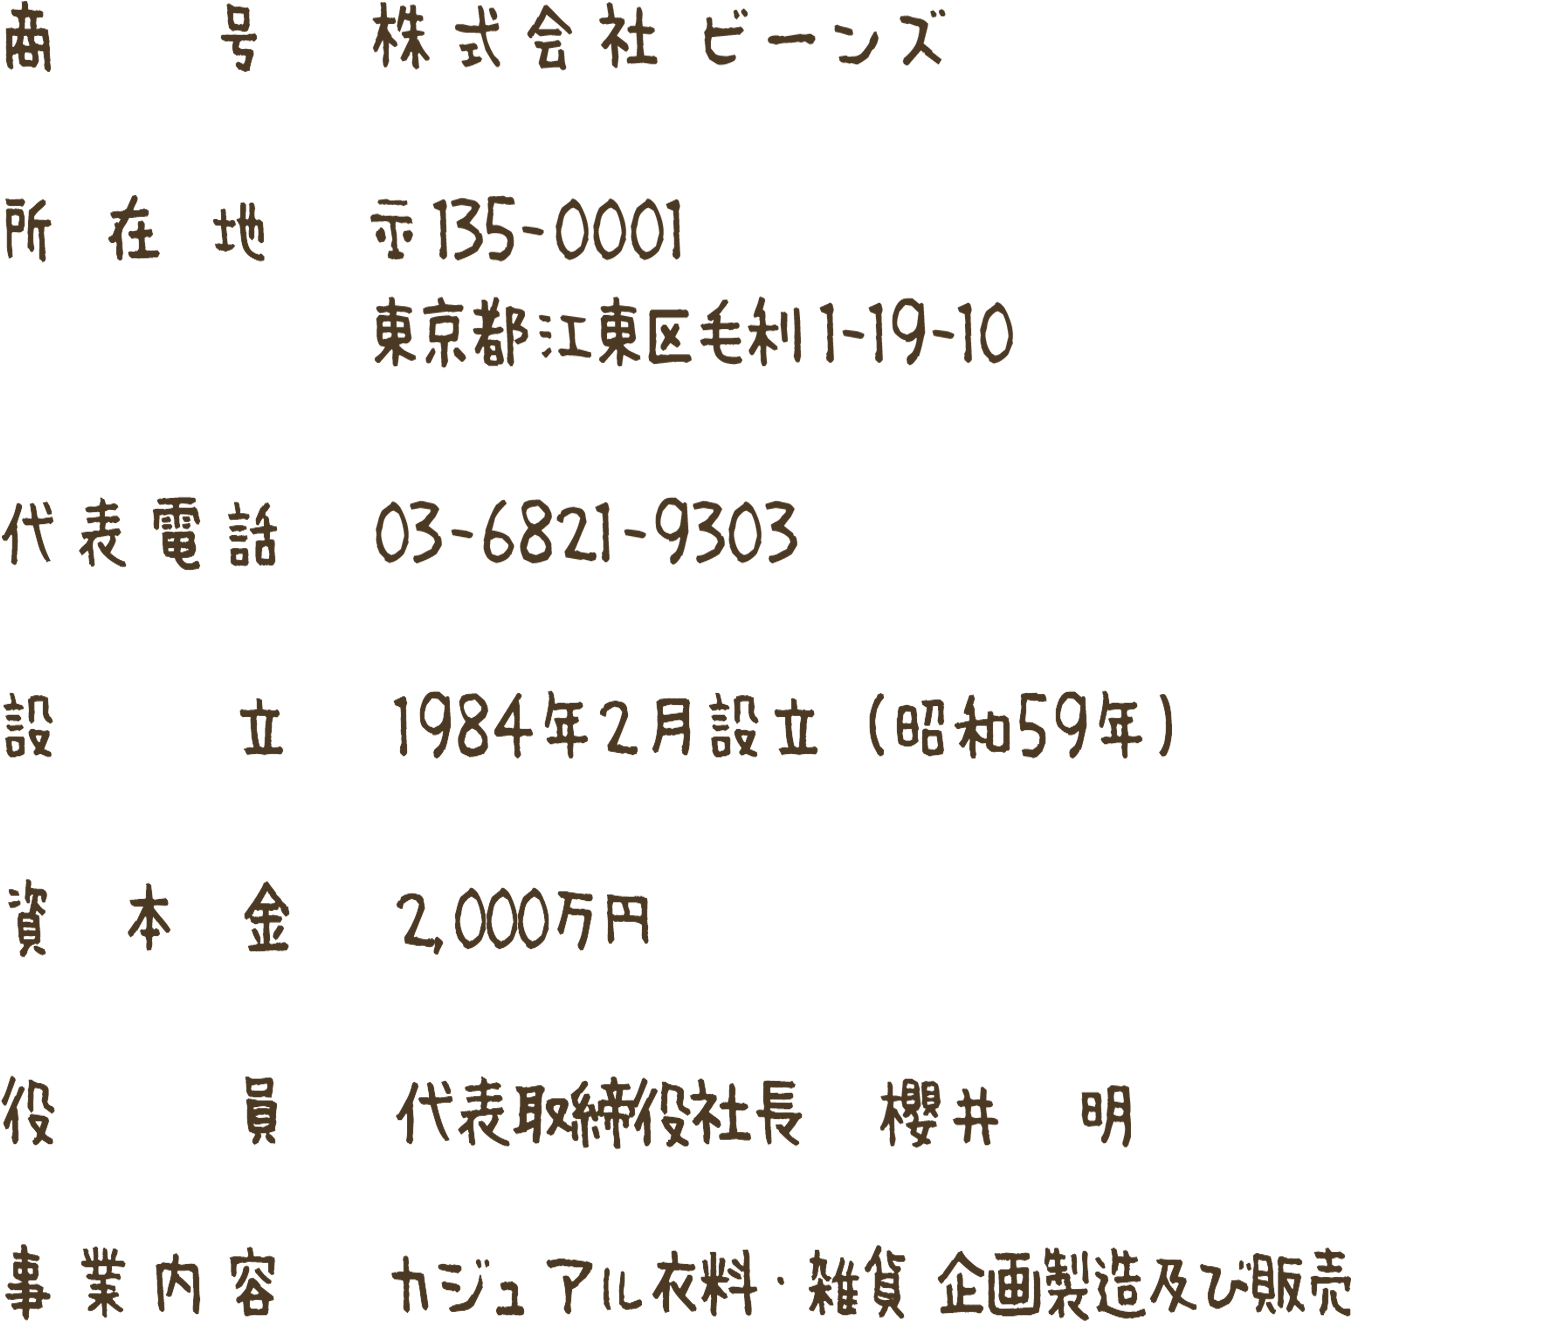 company_1.png